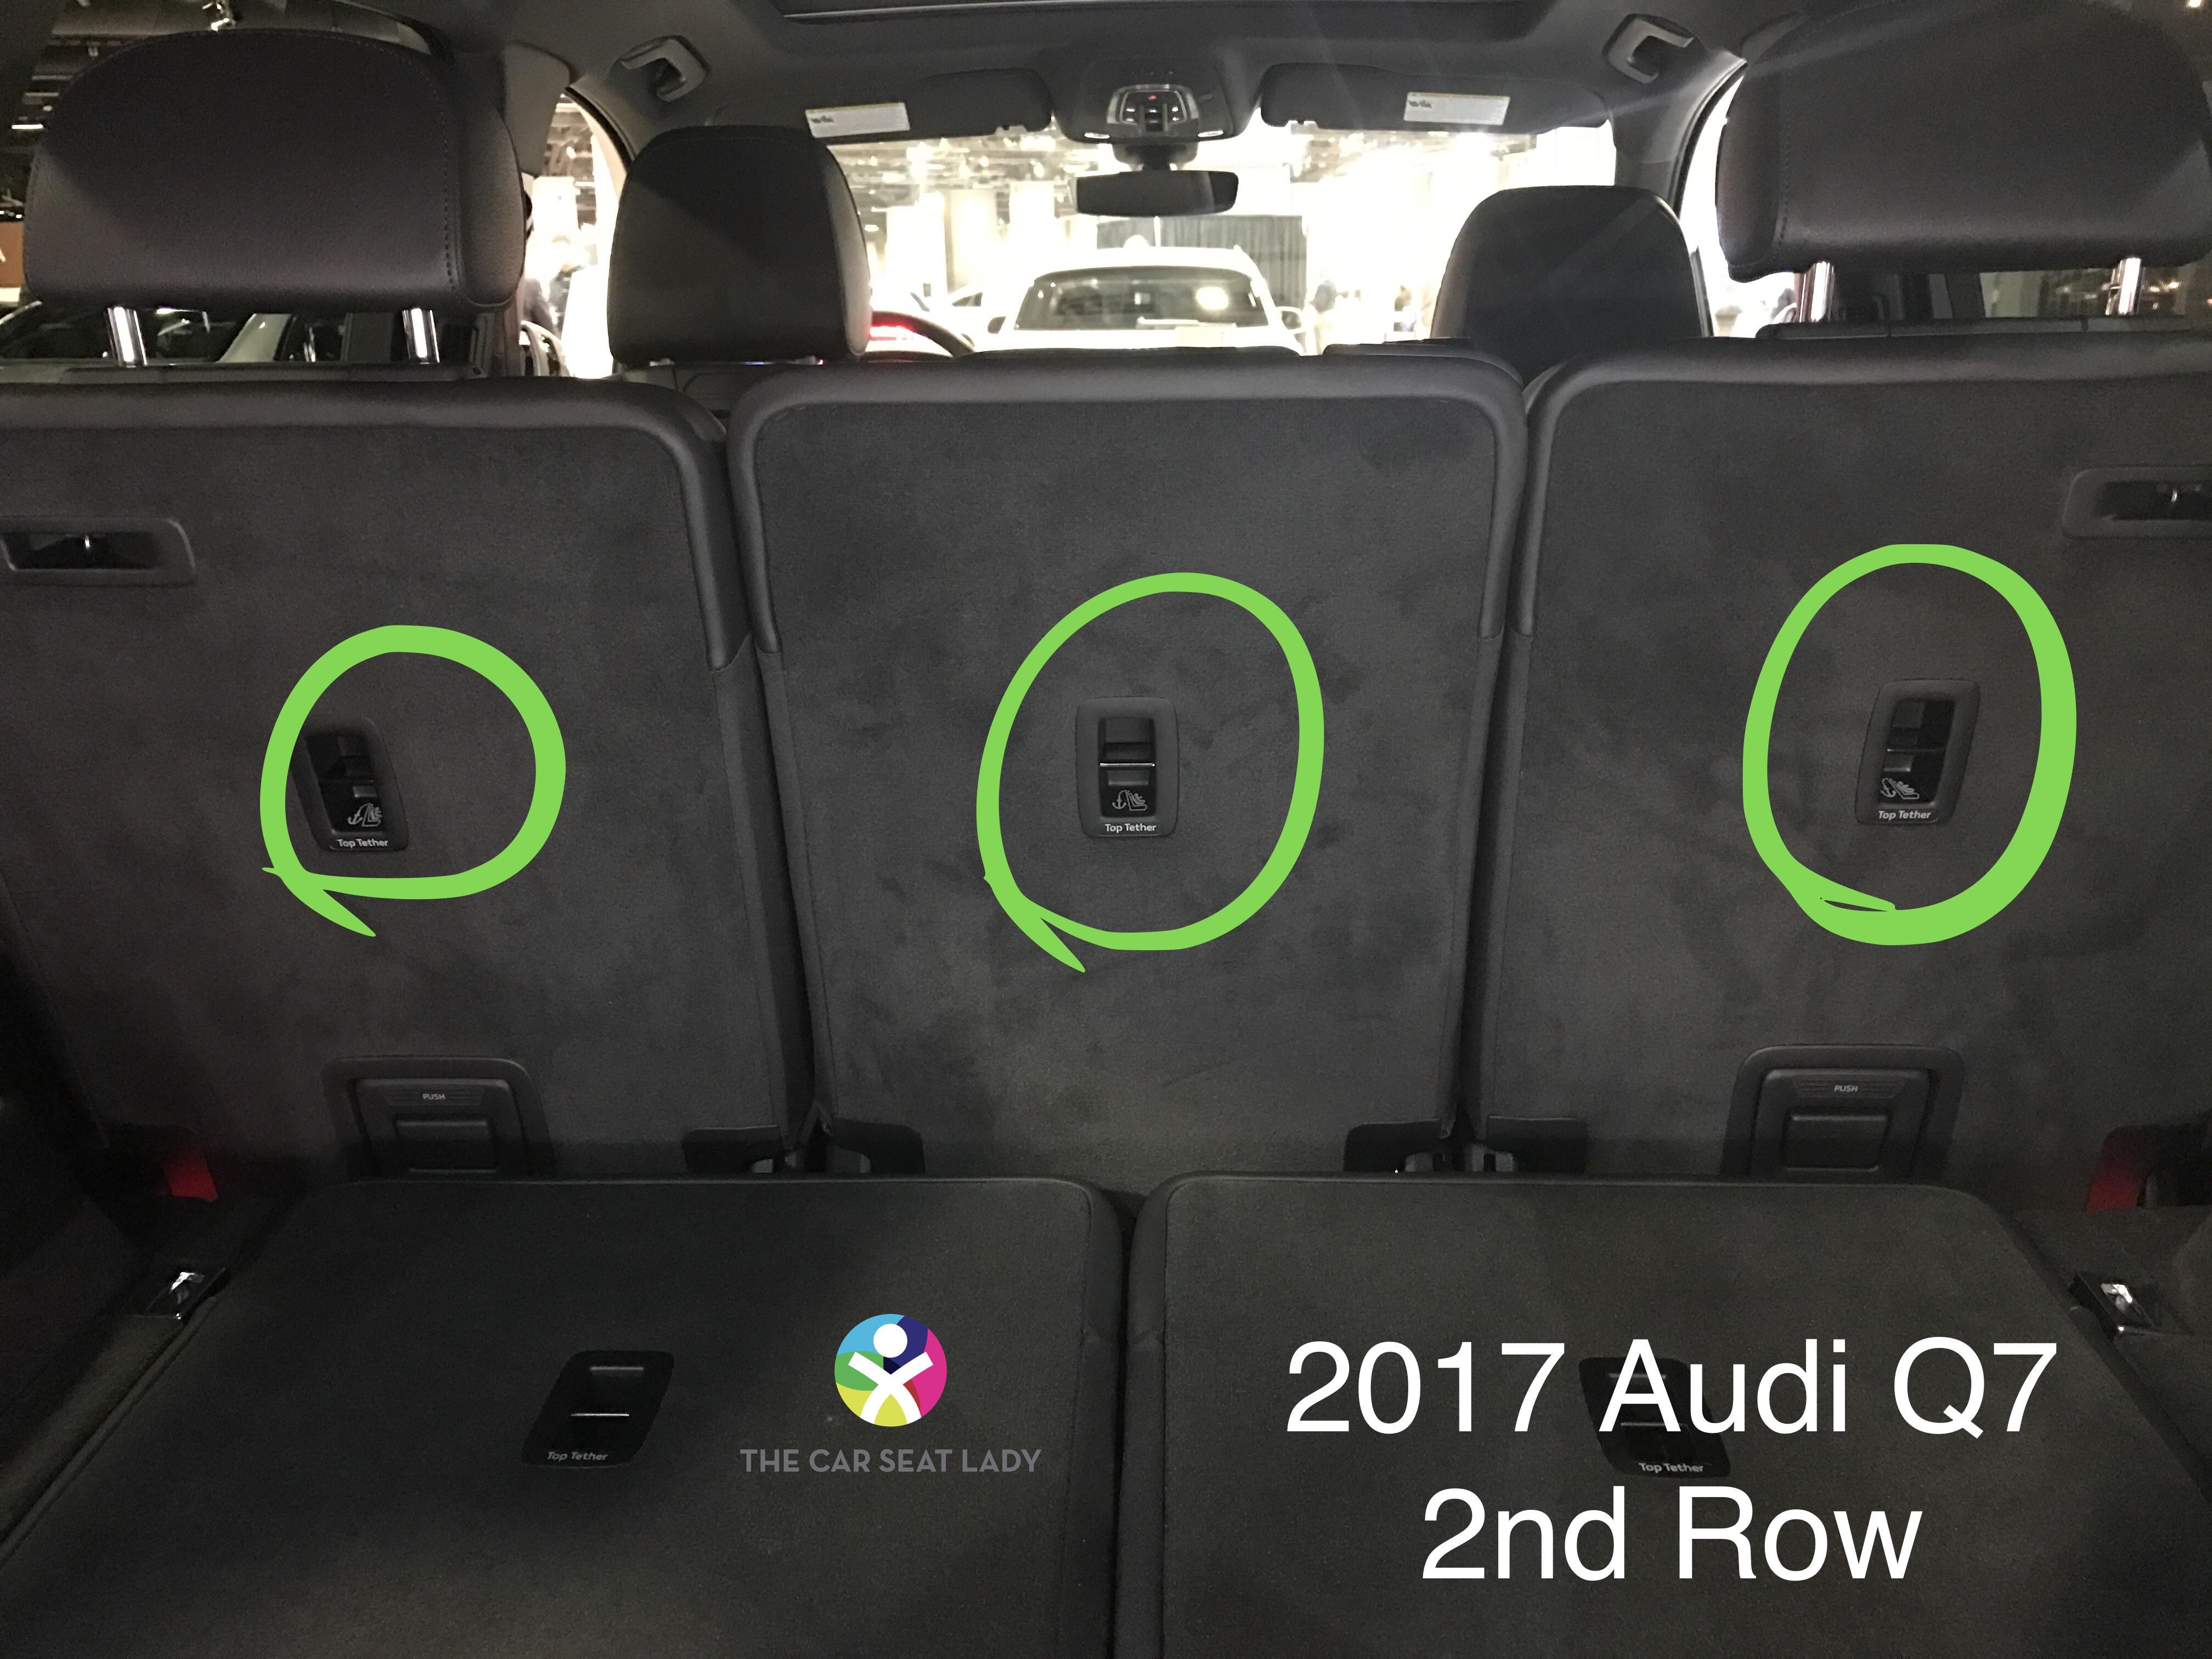 The Car Seat Lady Audi Q - Audi car seat